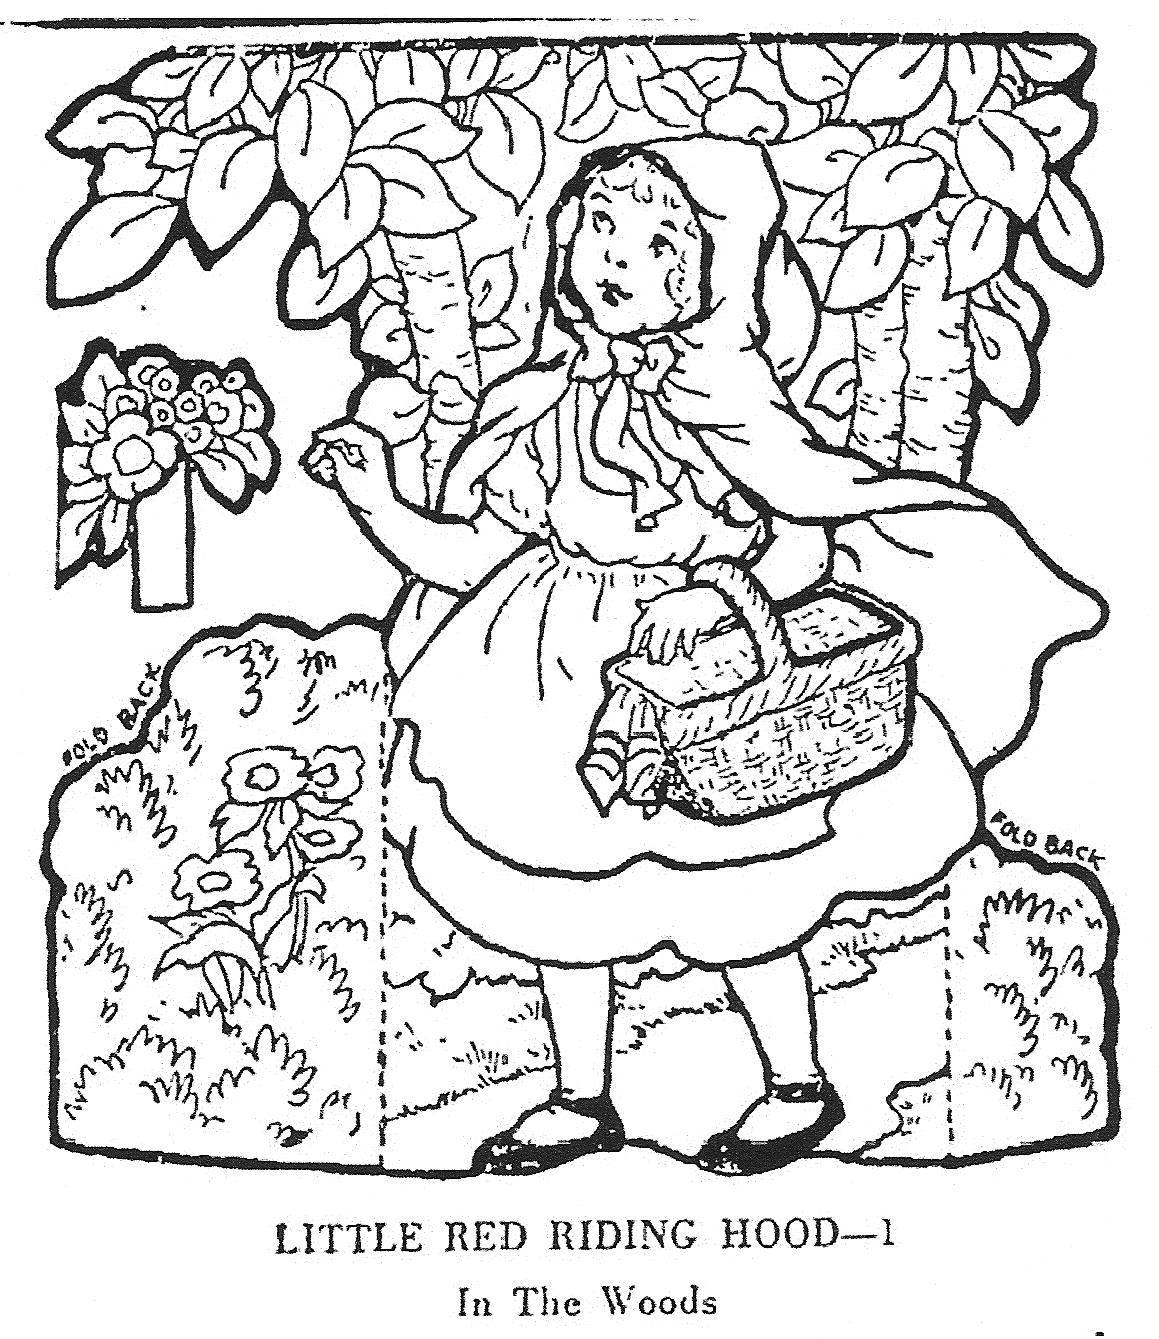 Little Red Riding Hood Junior Editors 1955 Little Red Ridding